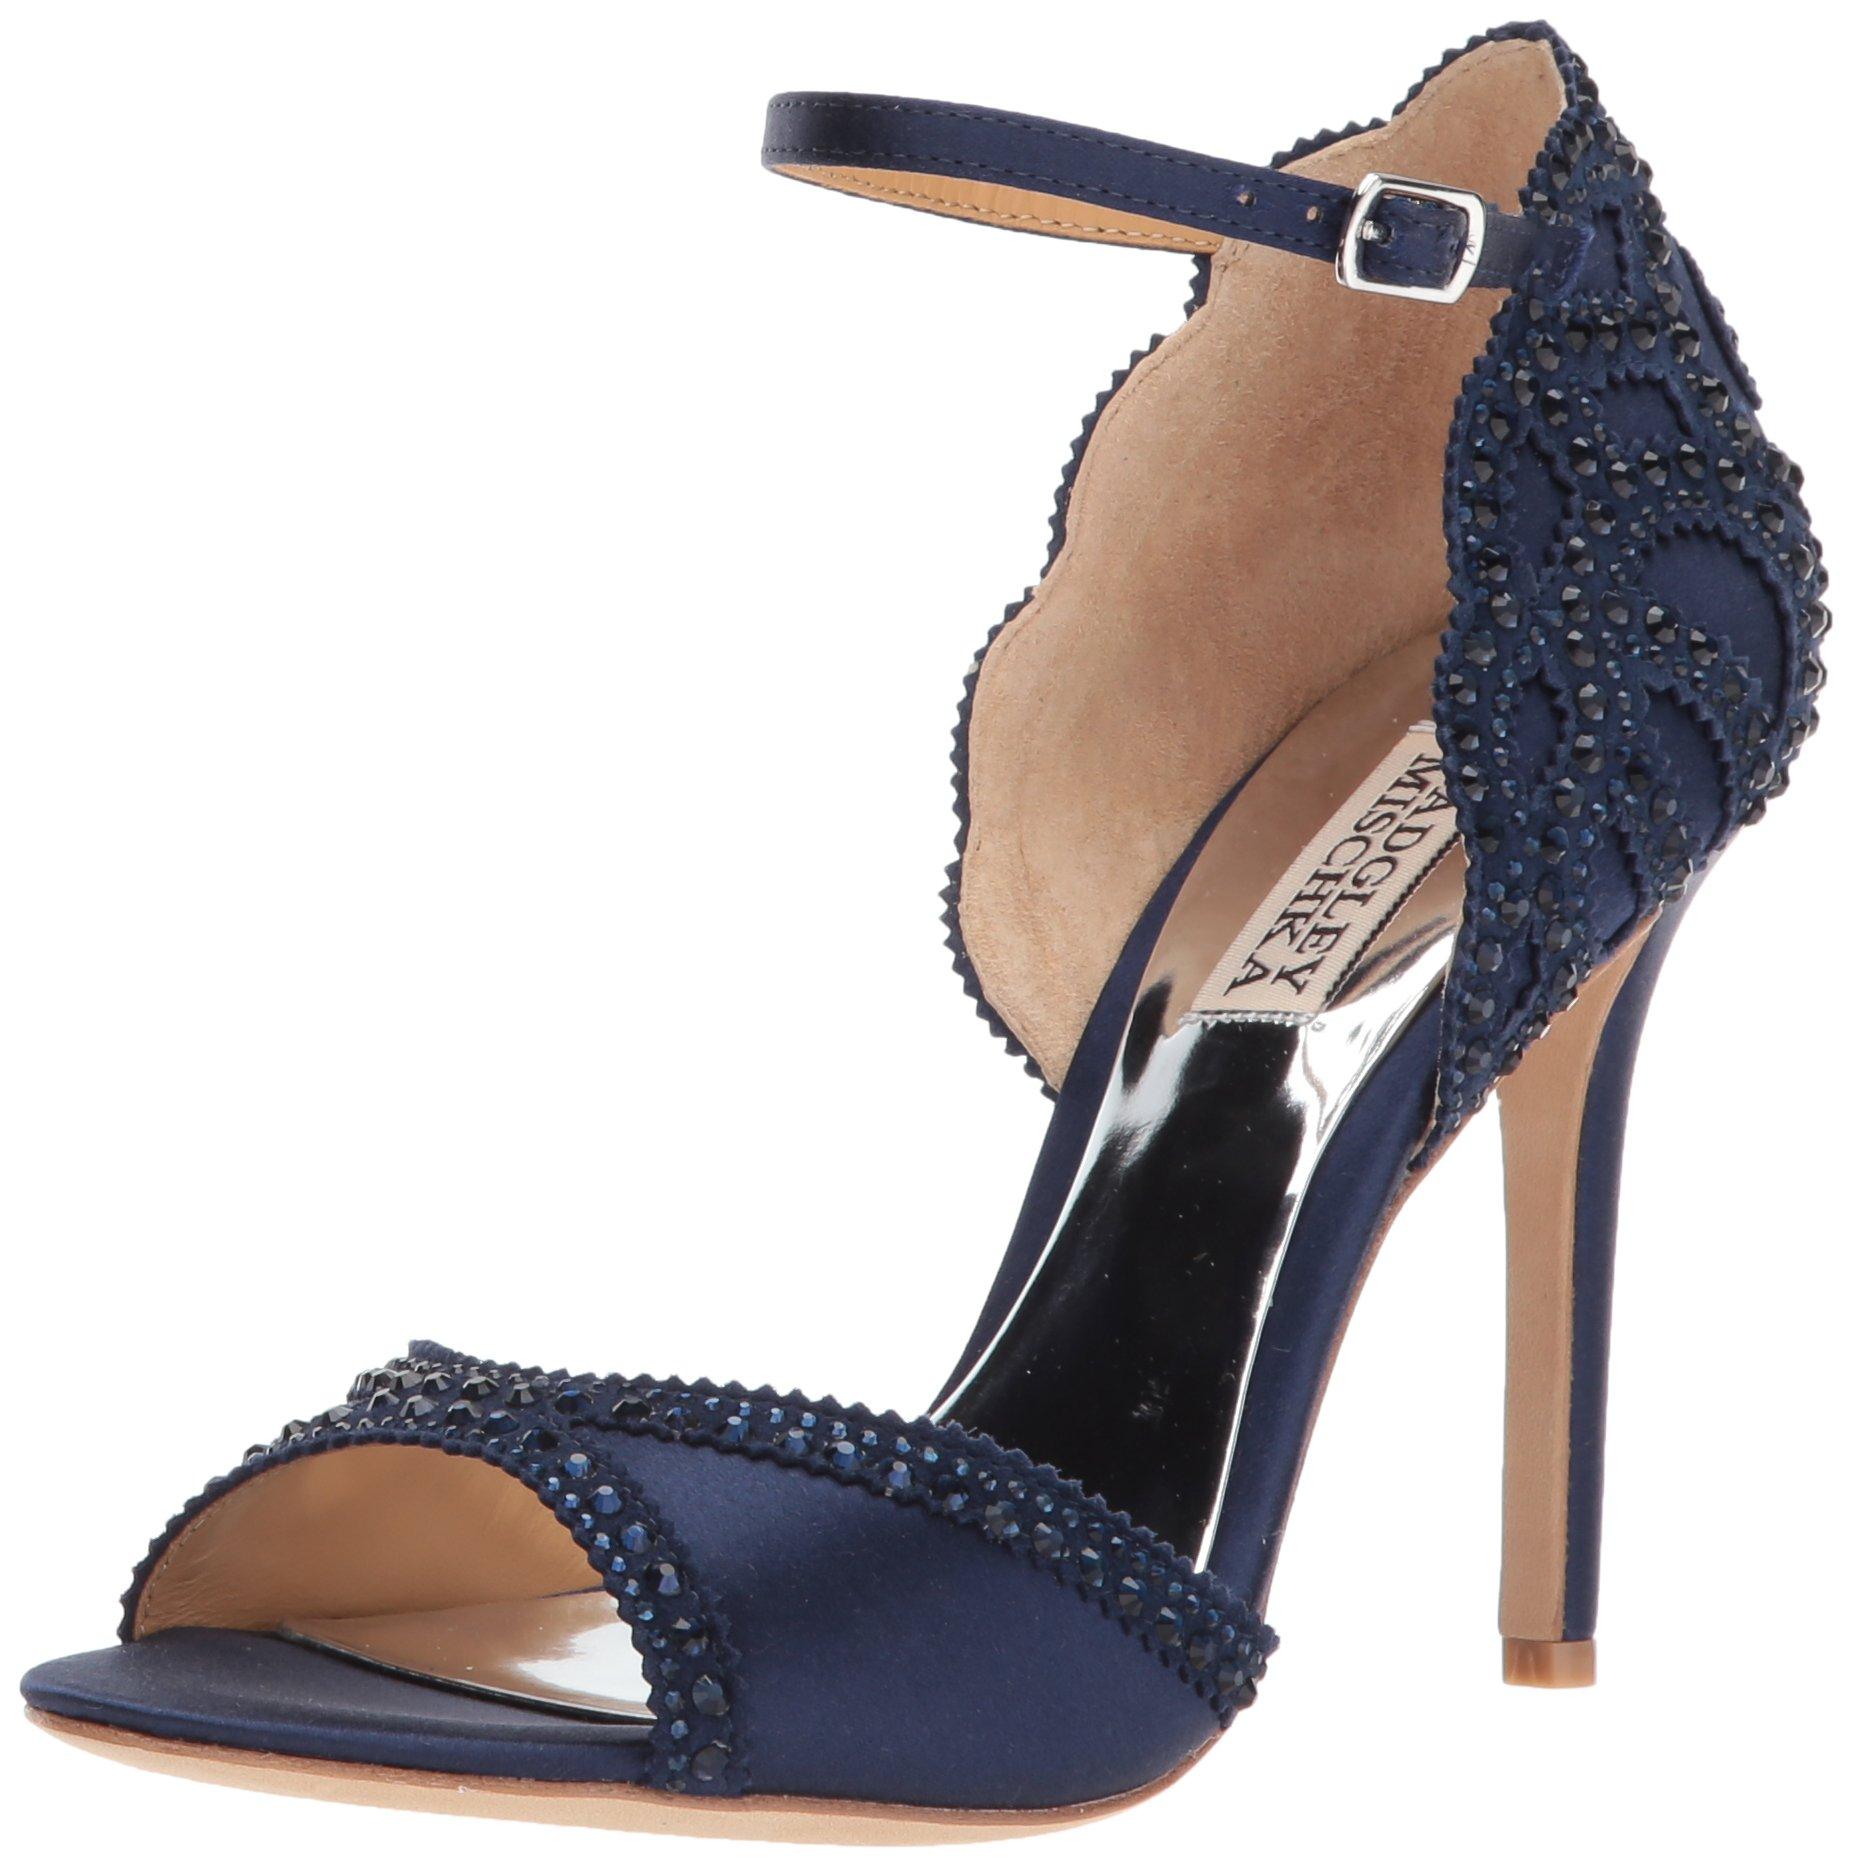 Badgley Mischka Women's Roxy Heeled Sandal, Midnight, 8 M US